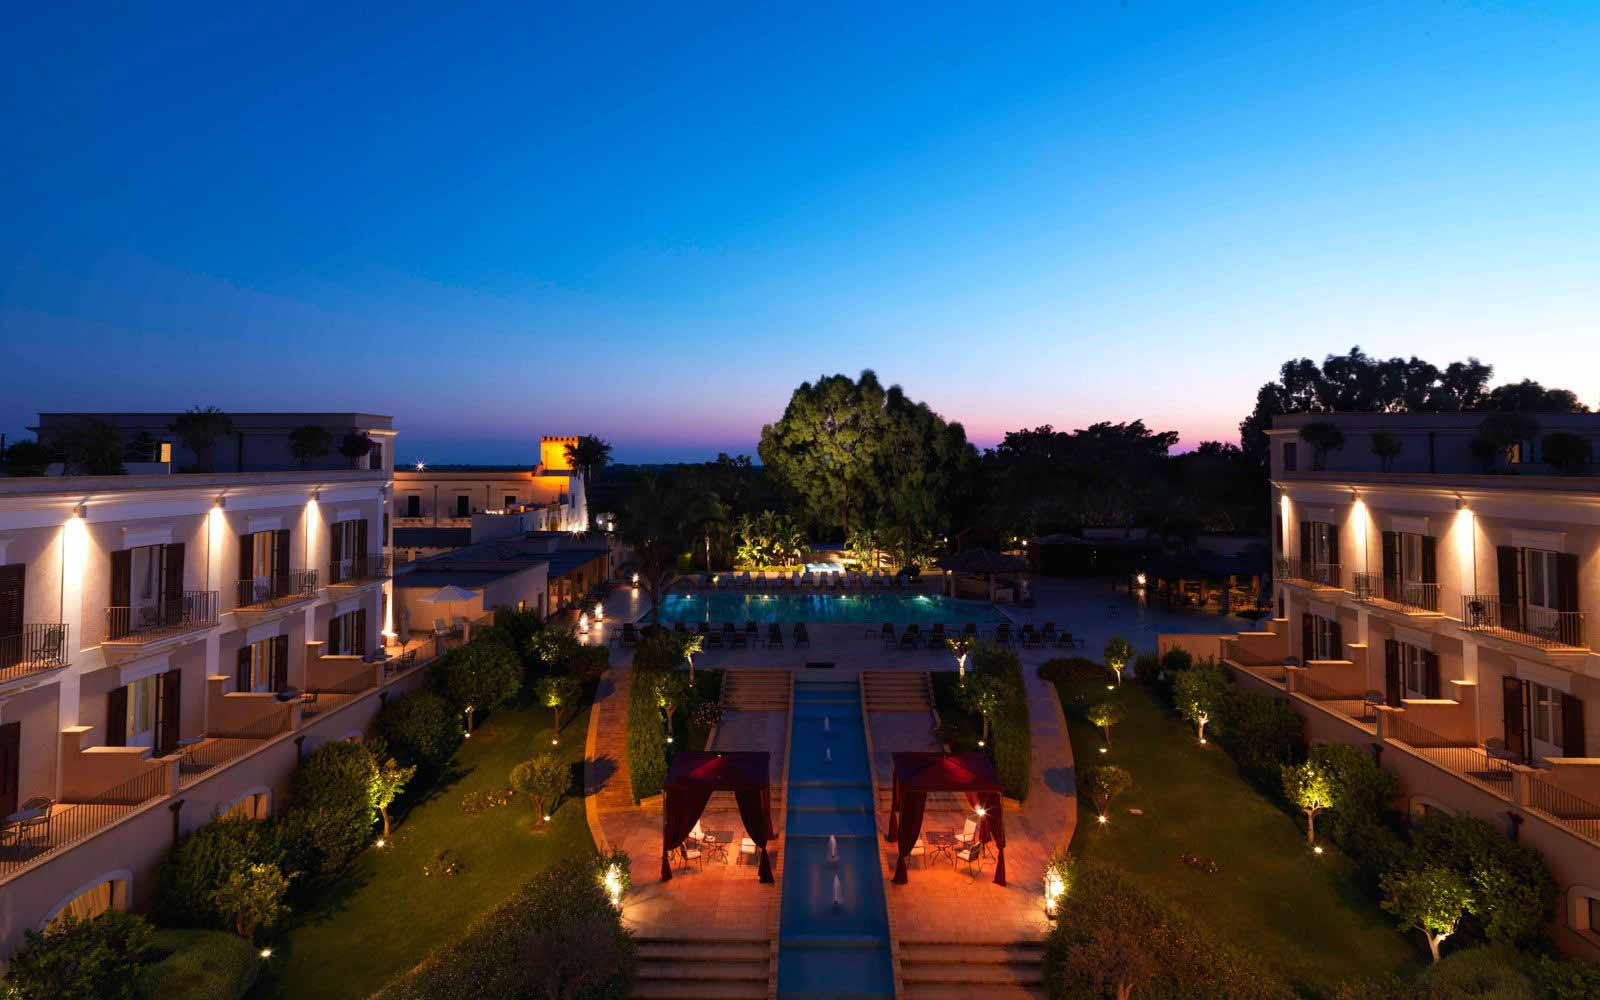 Hotel Giardino di Costanza at night